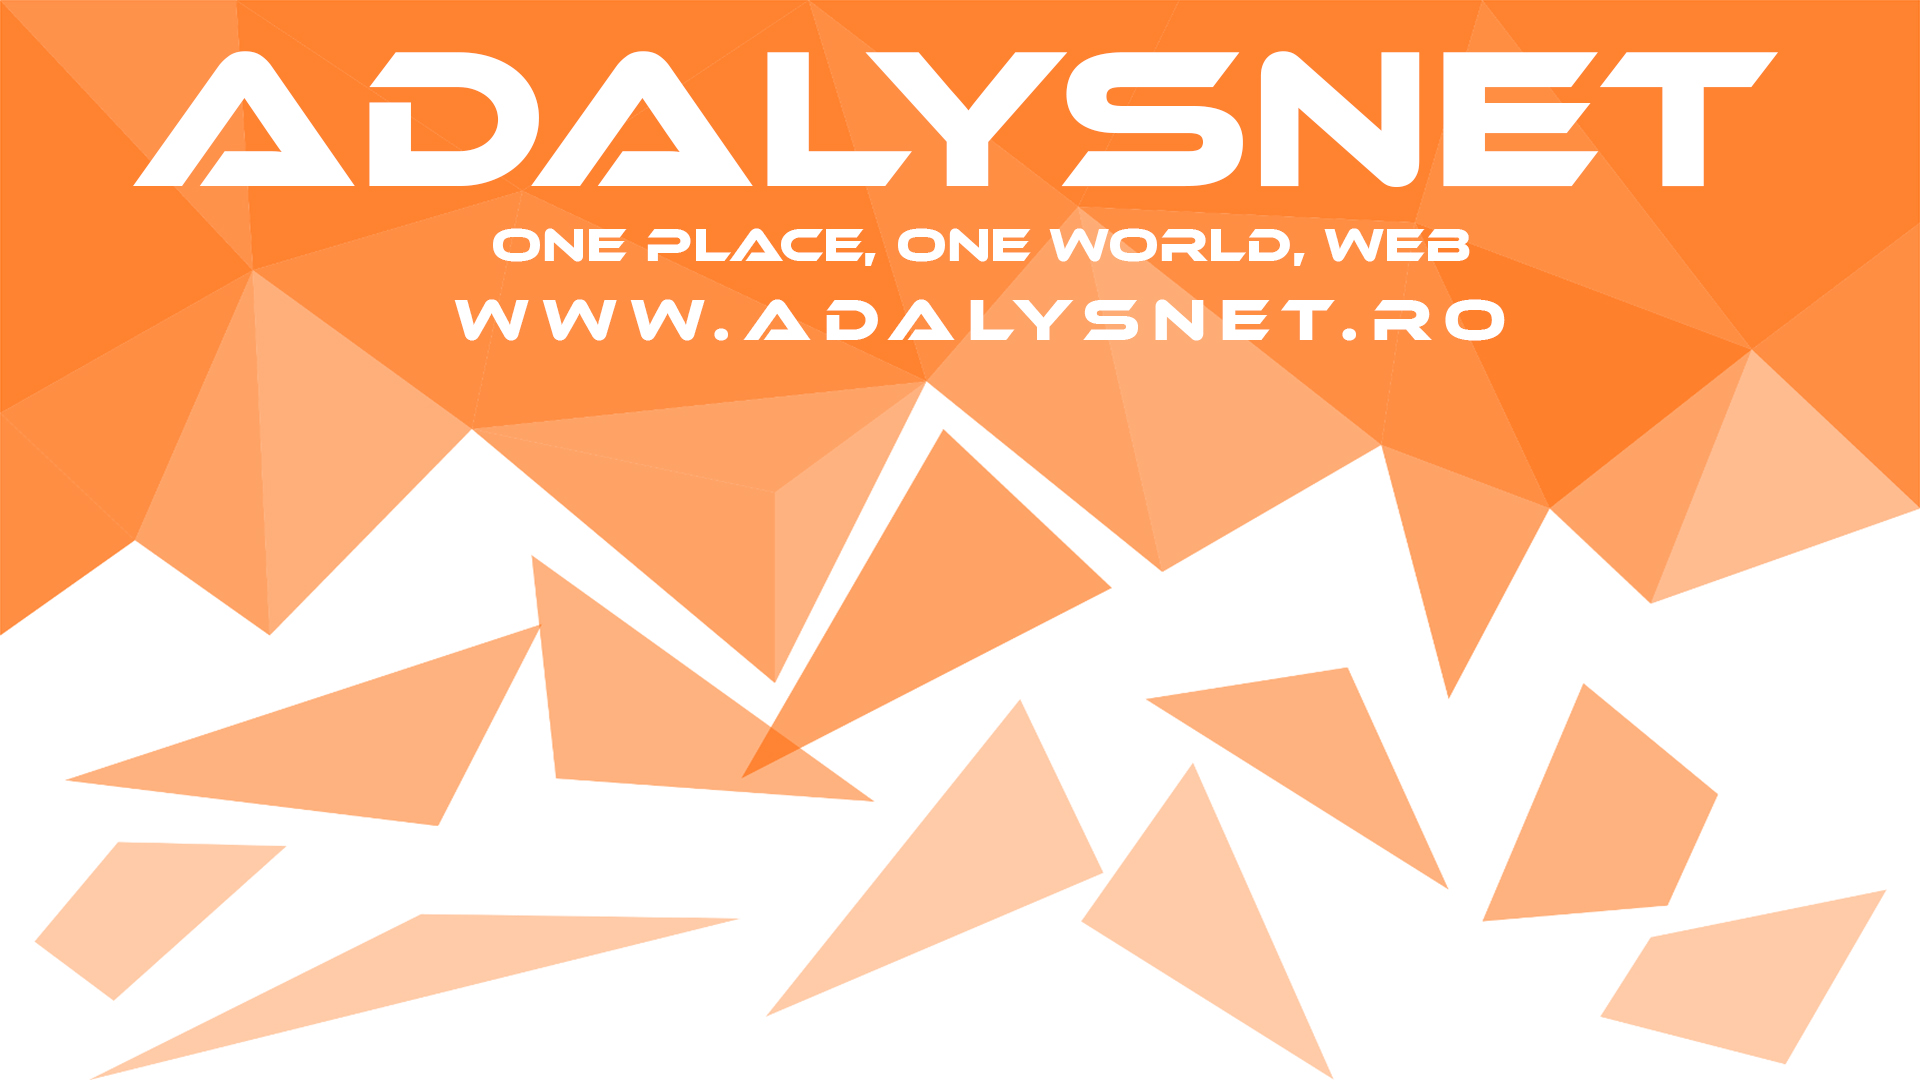 ADALYSNET